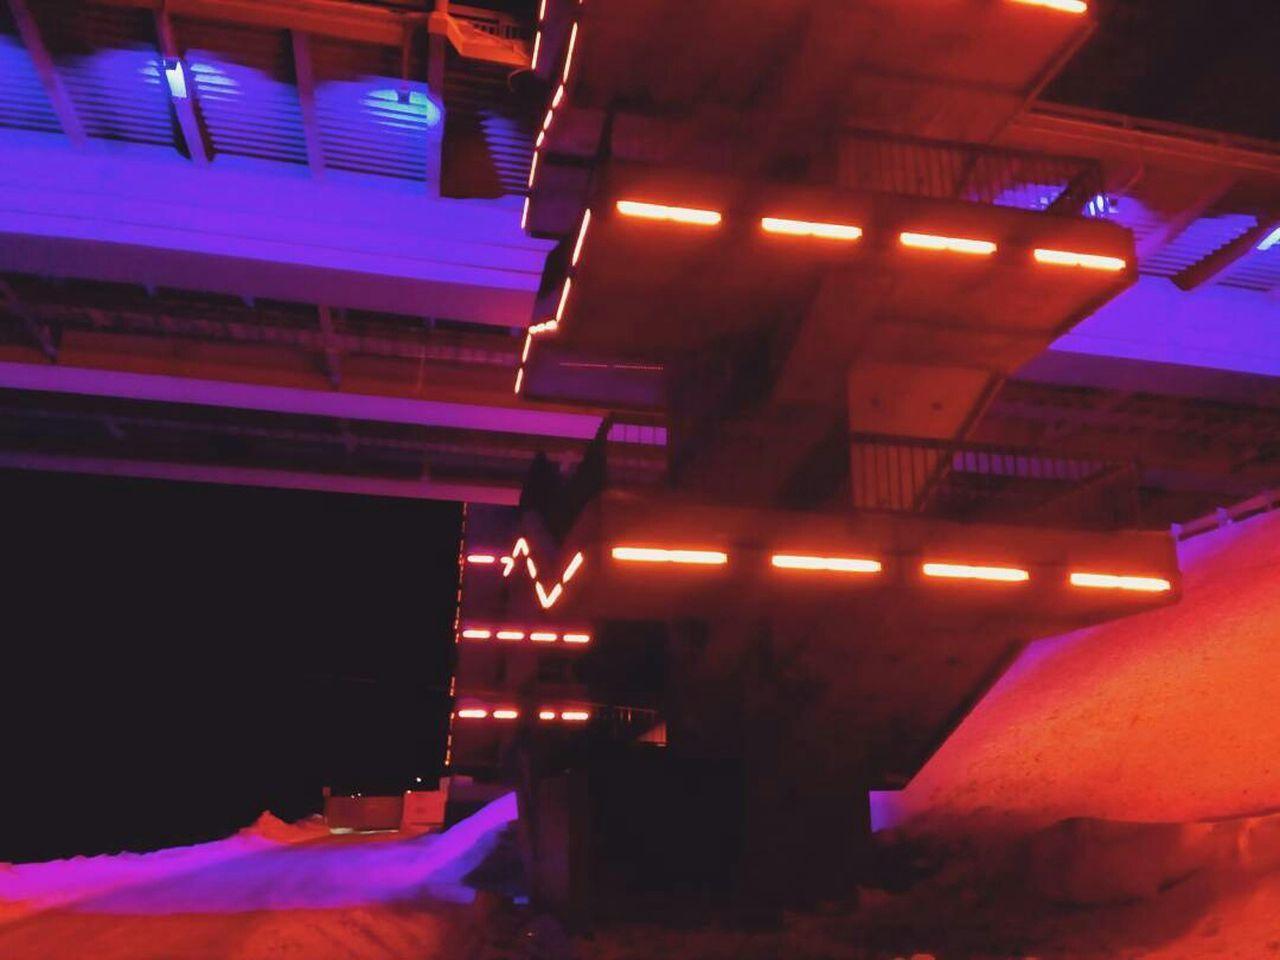 illuminated, lighting equipment, night, indoors, neon, architecture, no people